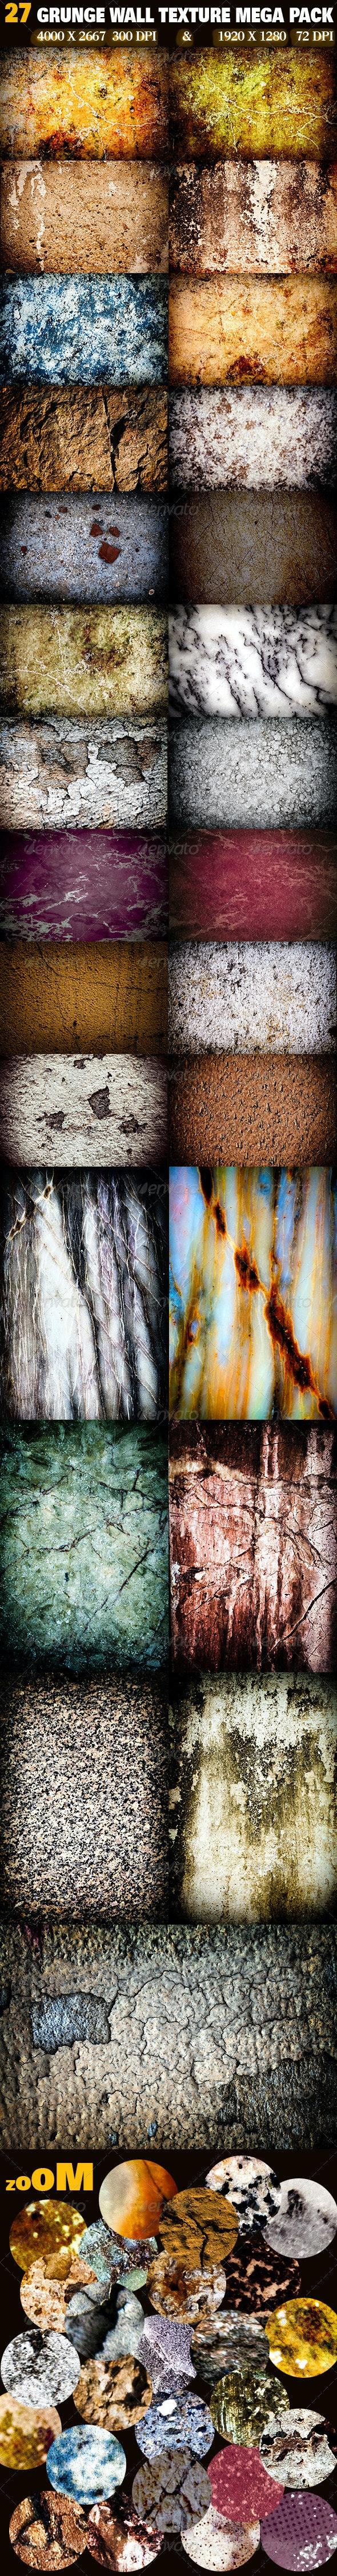 27 Grunge Wall Texture Mega Pack - Industrial / Grunge Textures